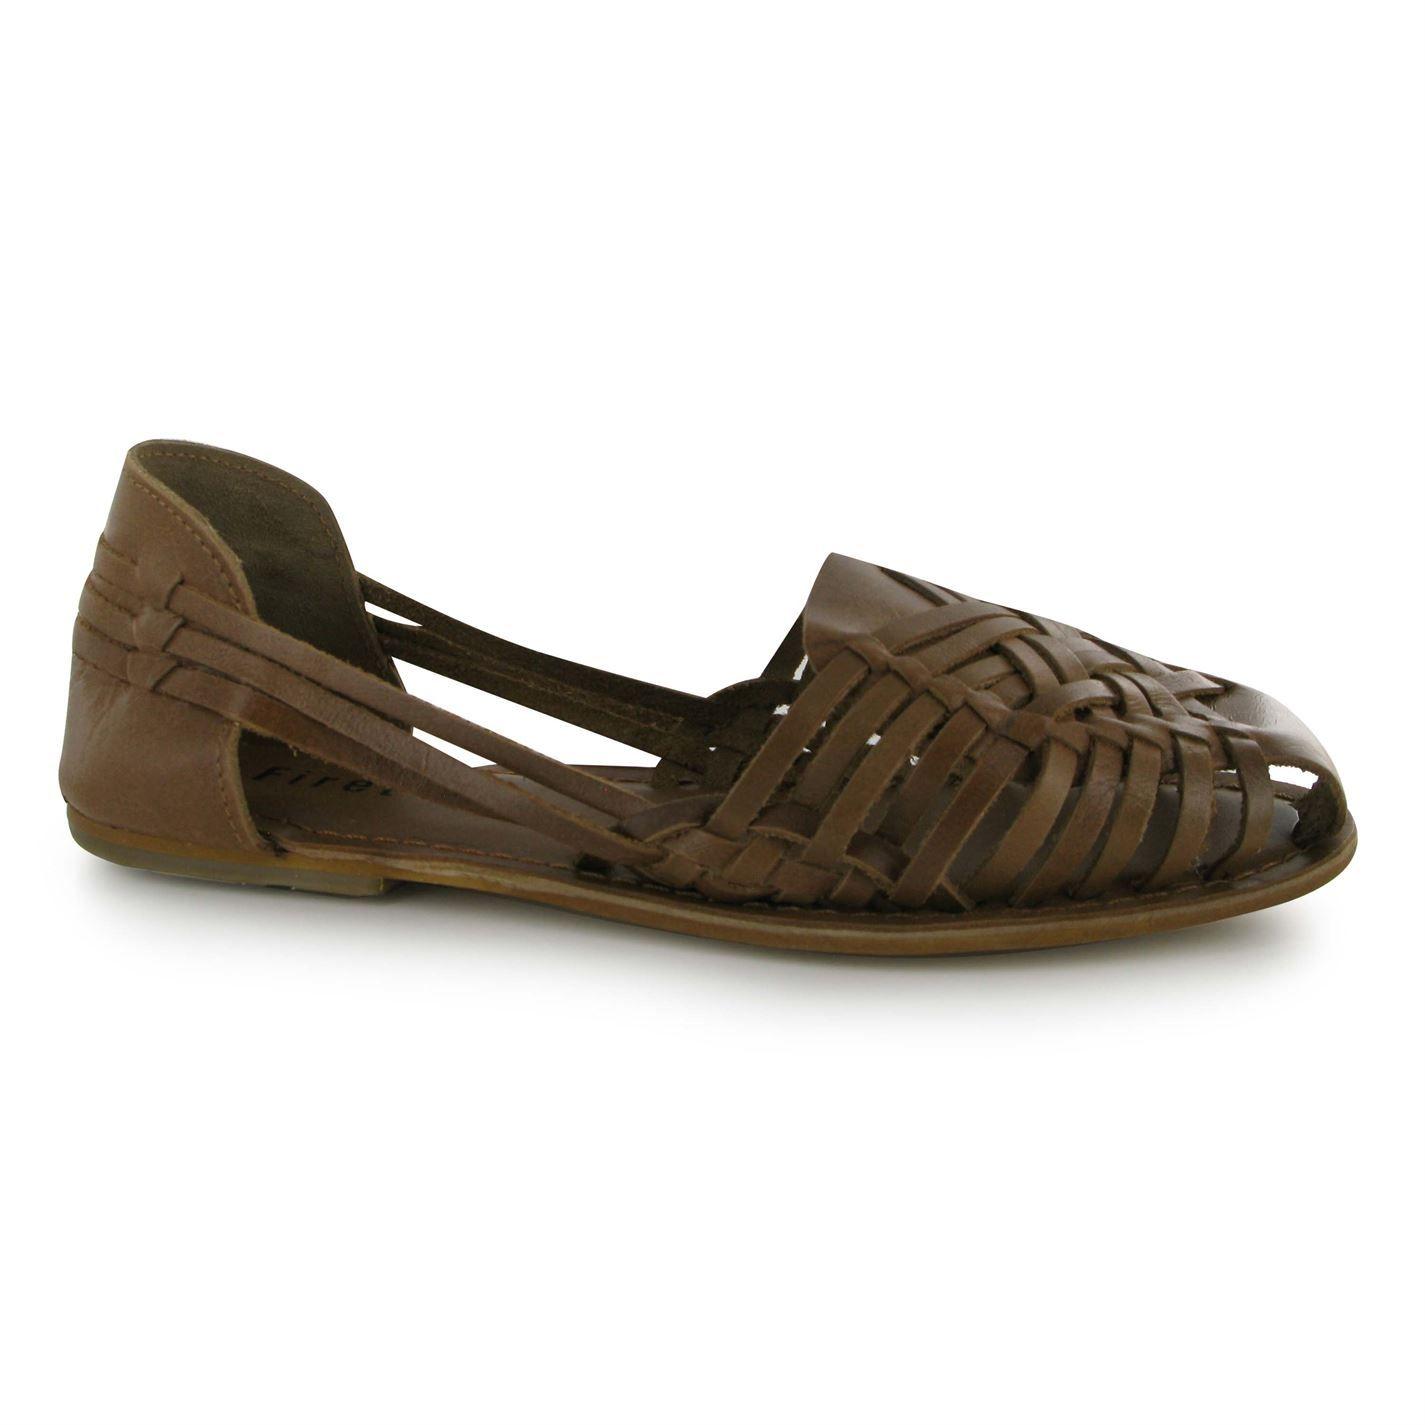 Firetrap   Firetrap Hydra Hur Sandals Ladies   Ladies sandals